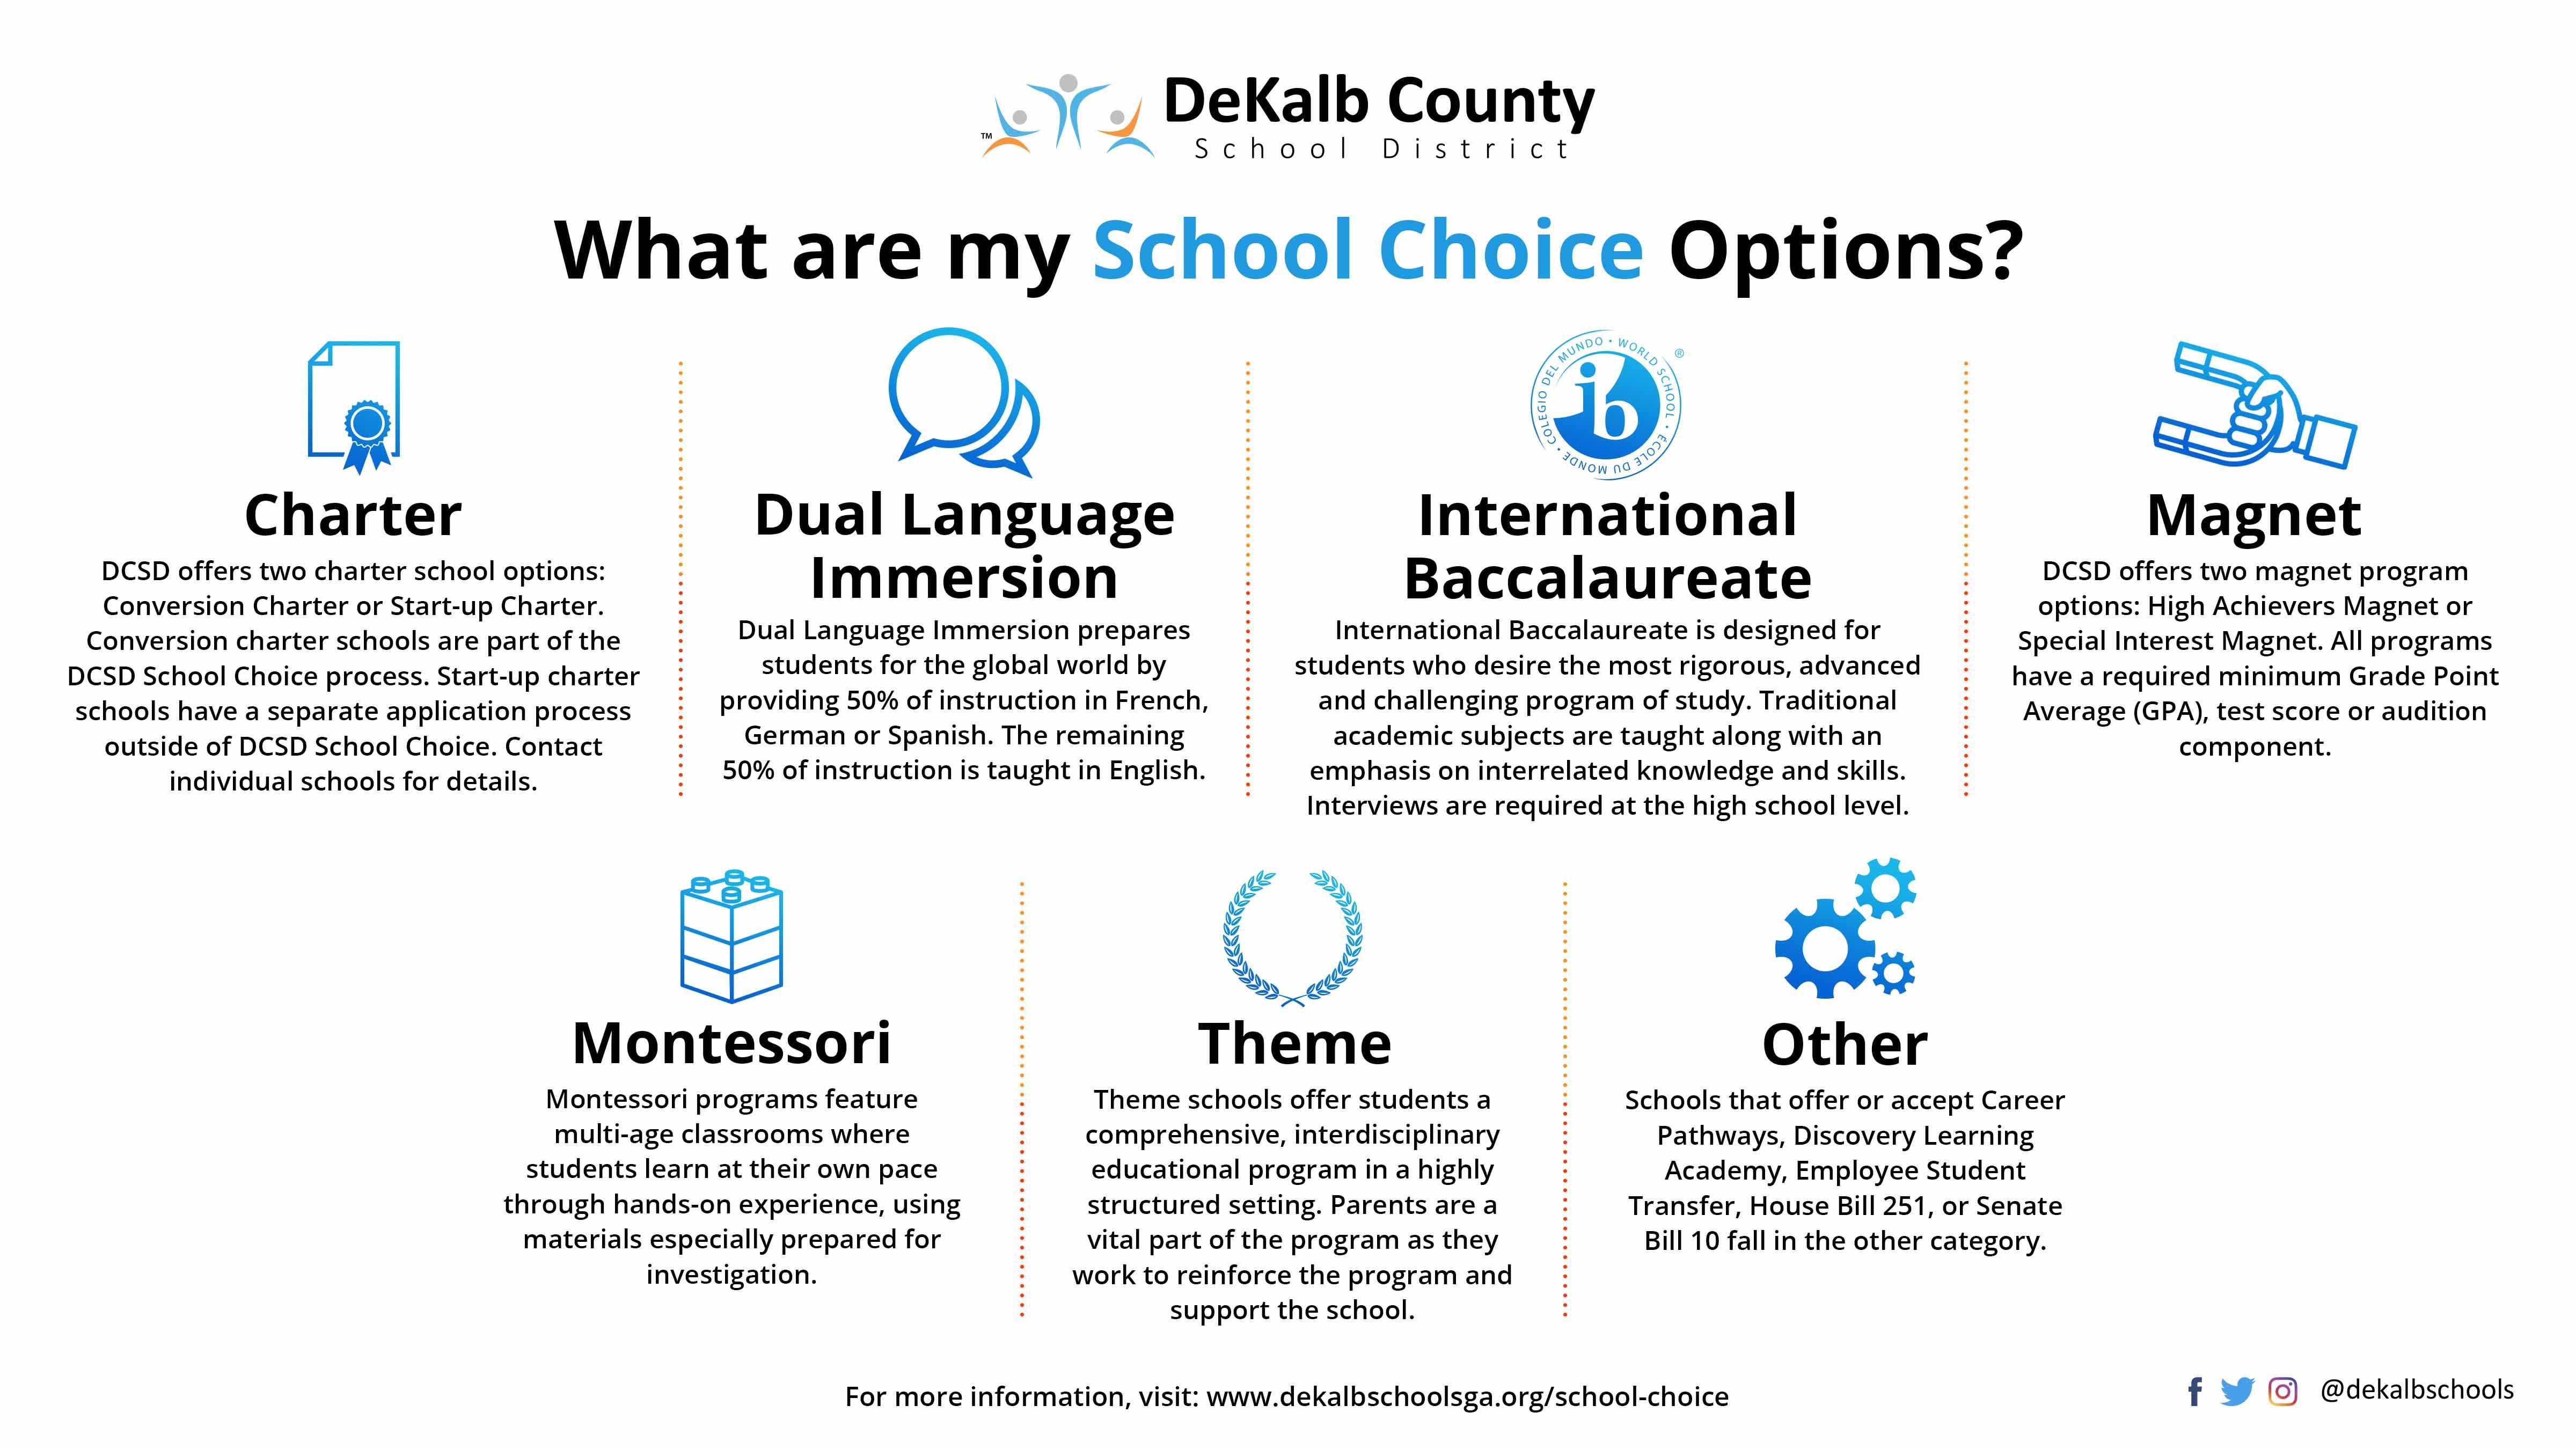 dekalb county school calendar 2019